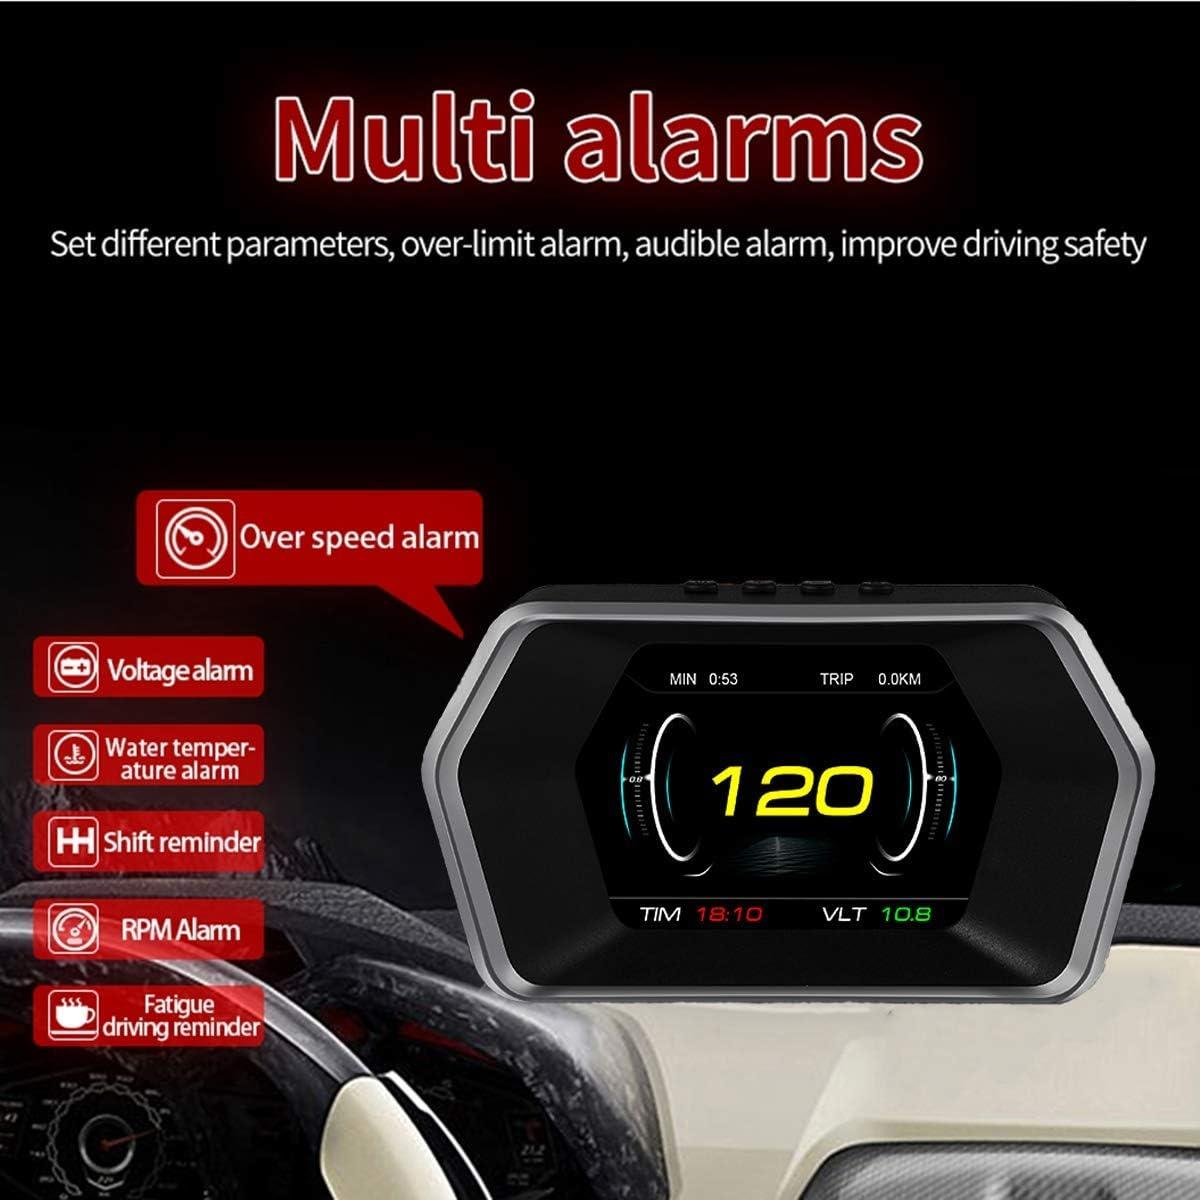 X6 3 Quot OBD2 HUD Head Up Display OBD2 Vehicle Speedometer Over Speed Alarm